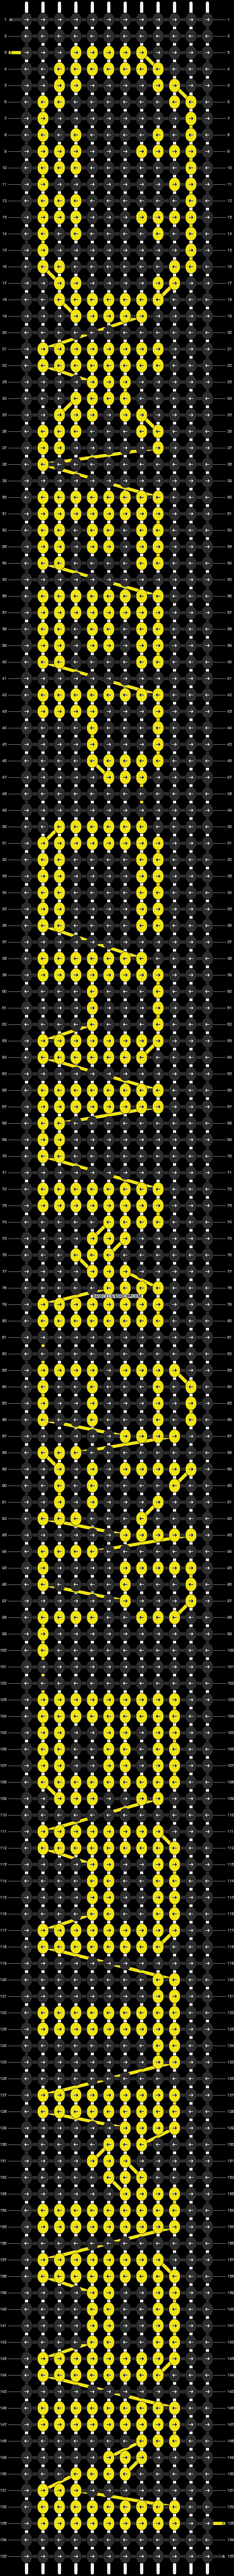 Alpha pattern #8880 pattern